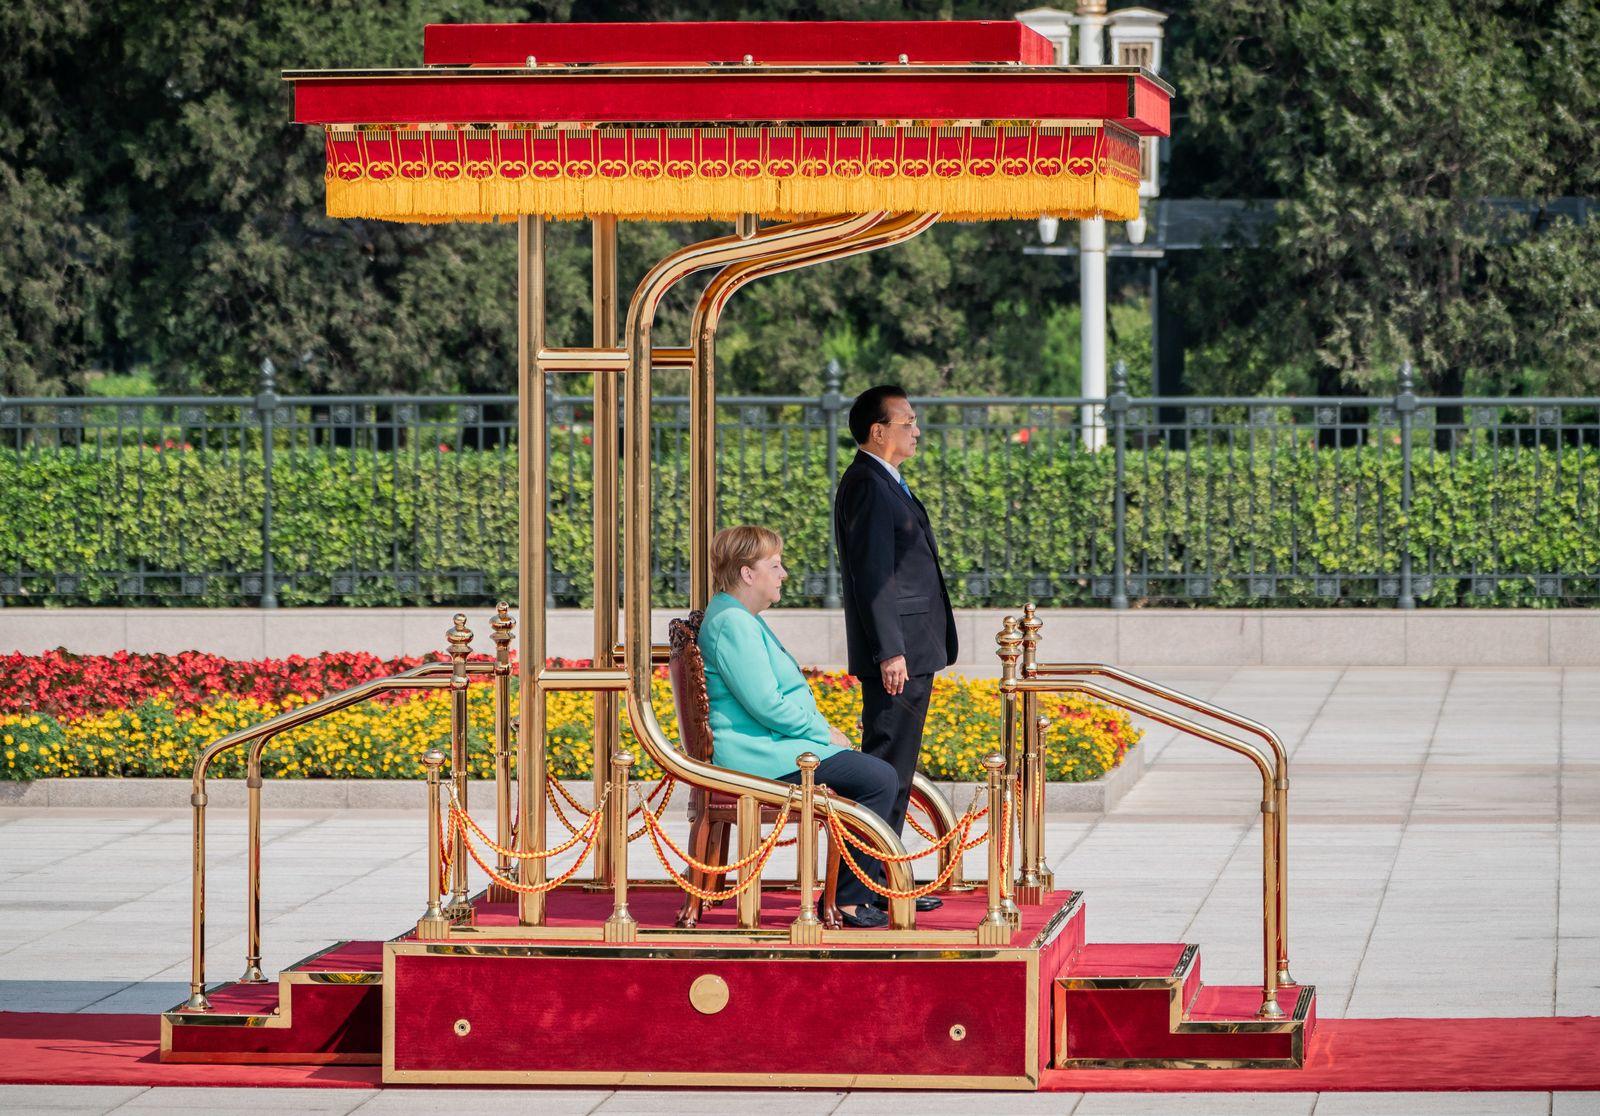 Bundeskanzlerin Angela Merkel in China